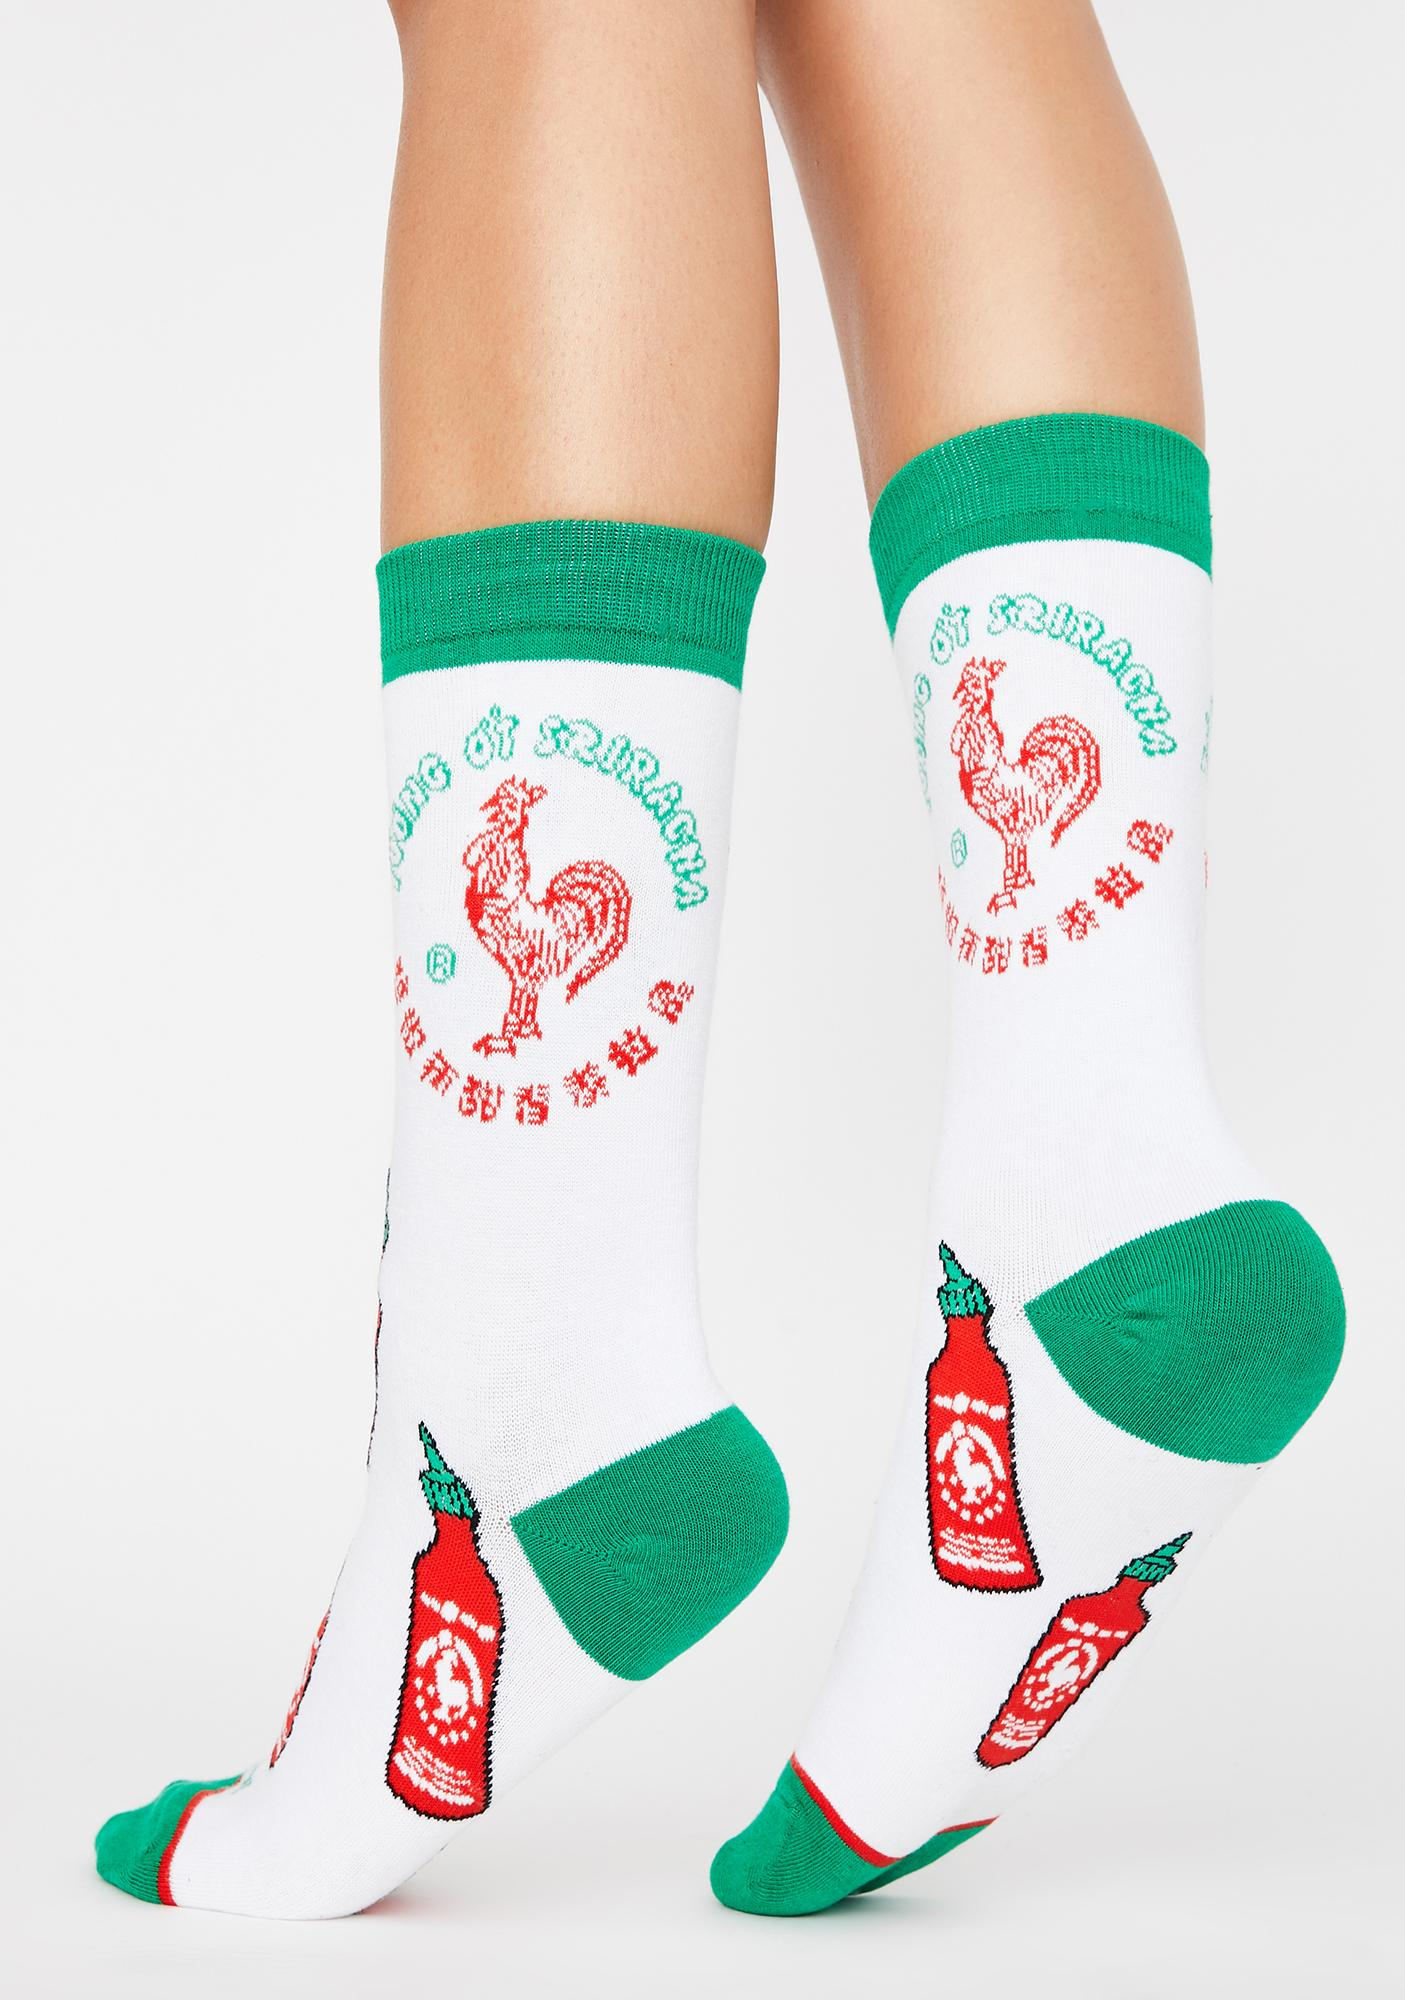 Cool Socks Sriracha All Over Crew Socks